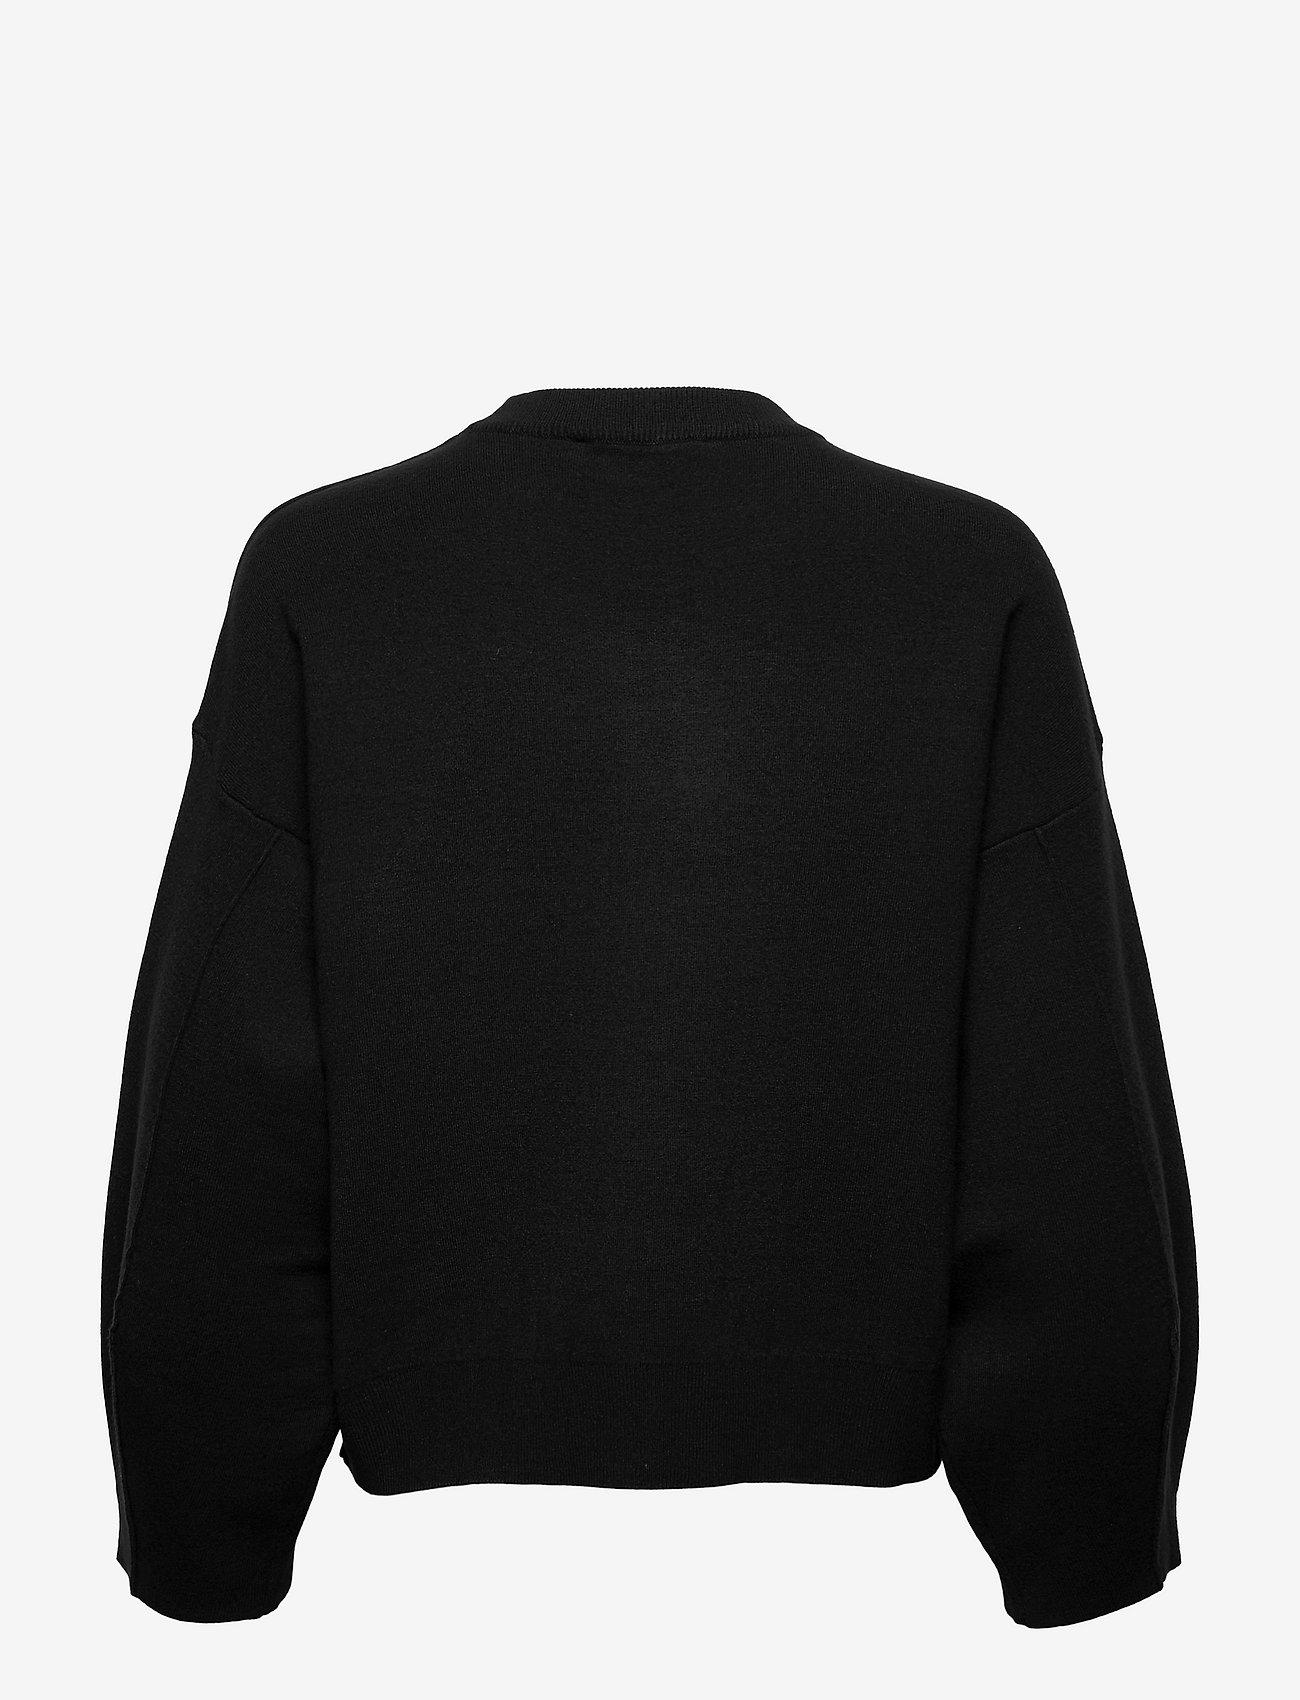 Gestuz - TalliGZ pullover NOOS - trøjer - black - 1